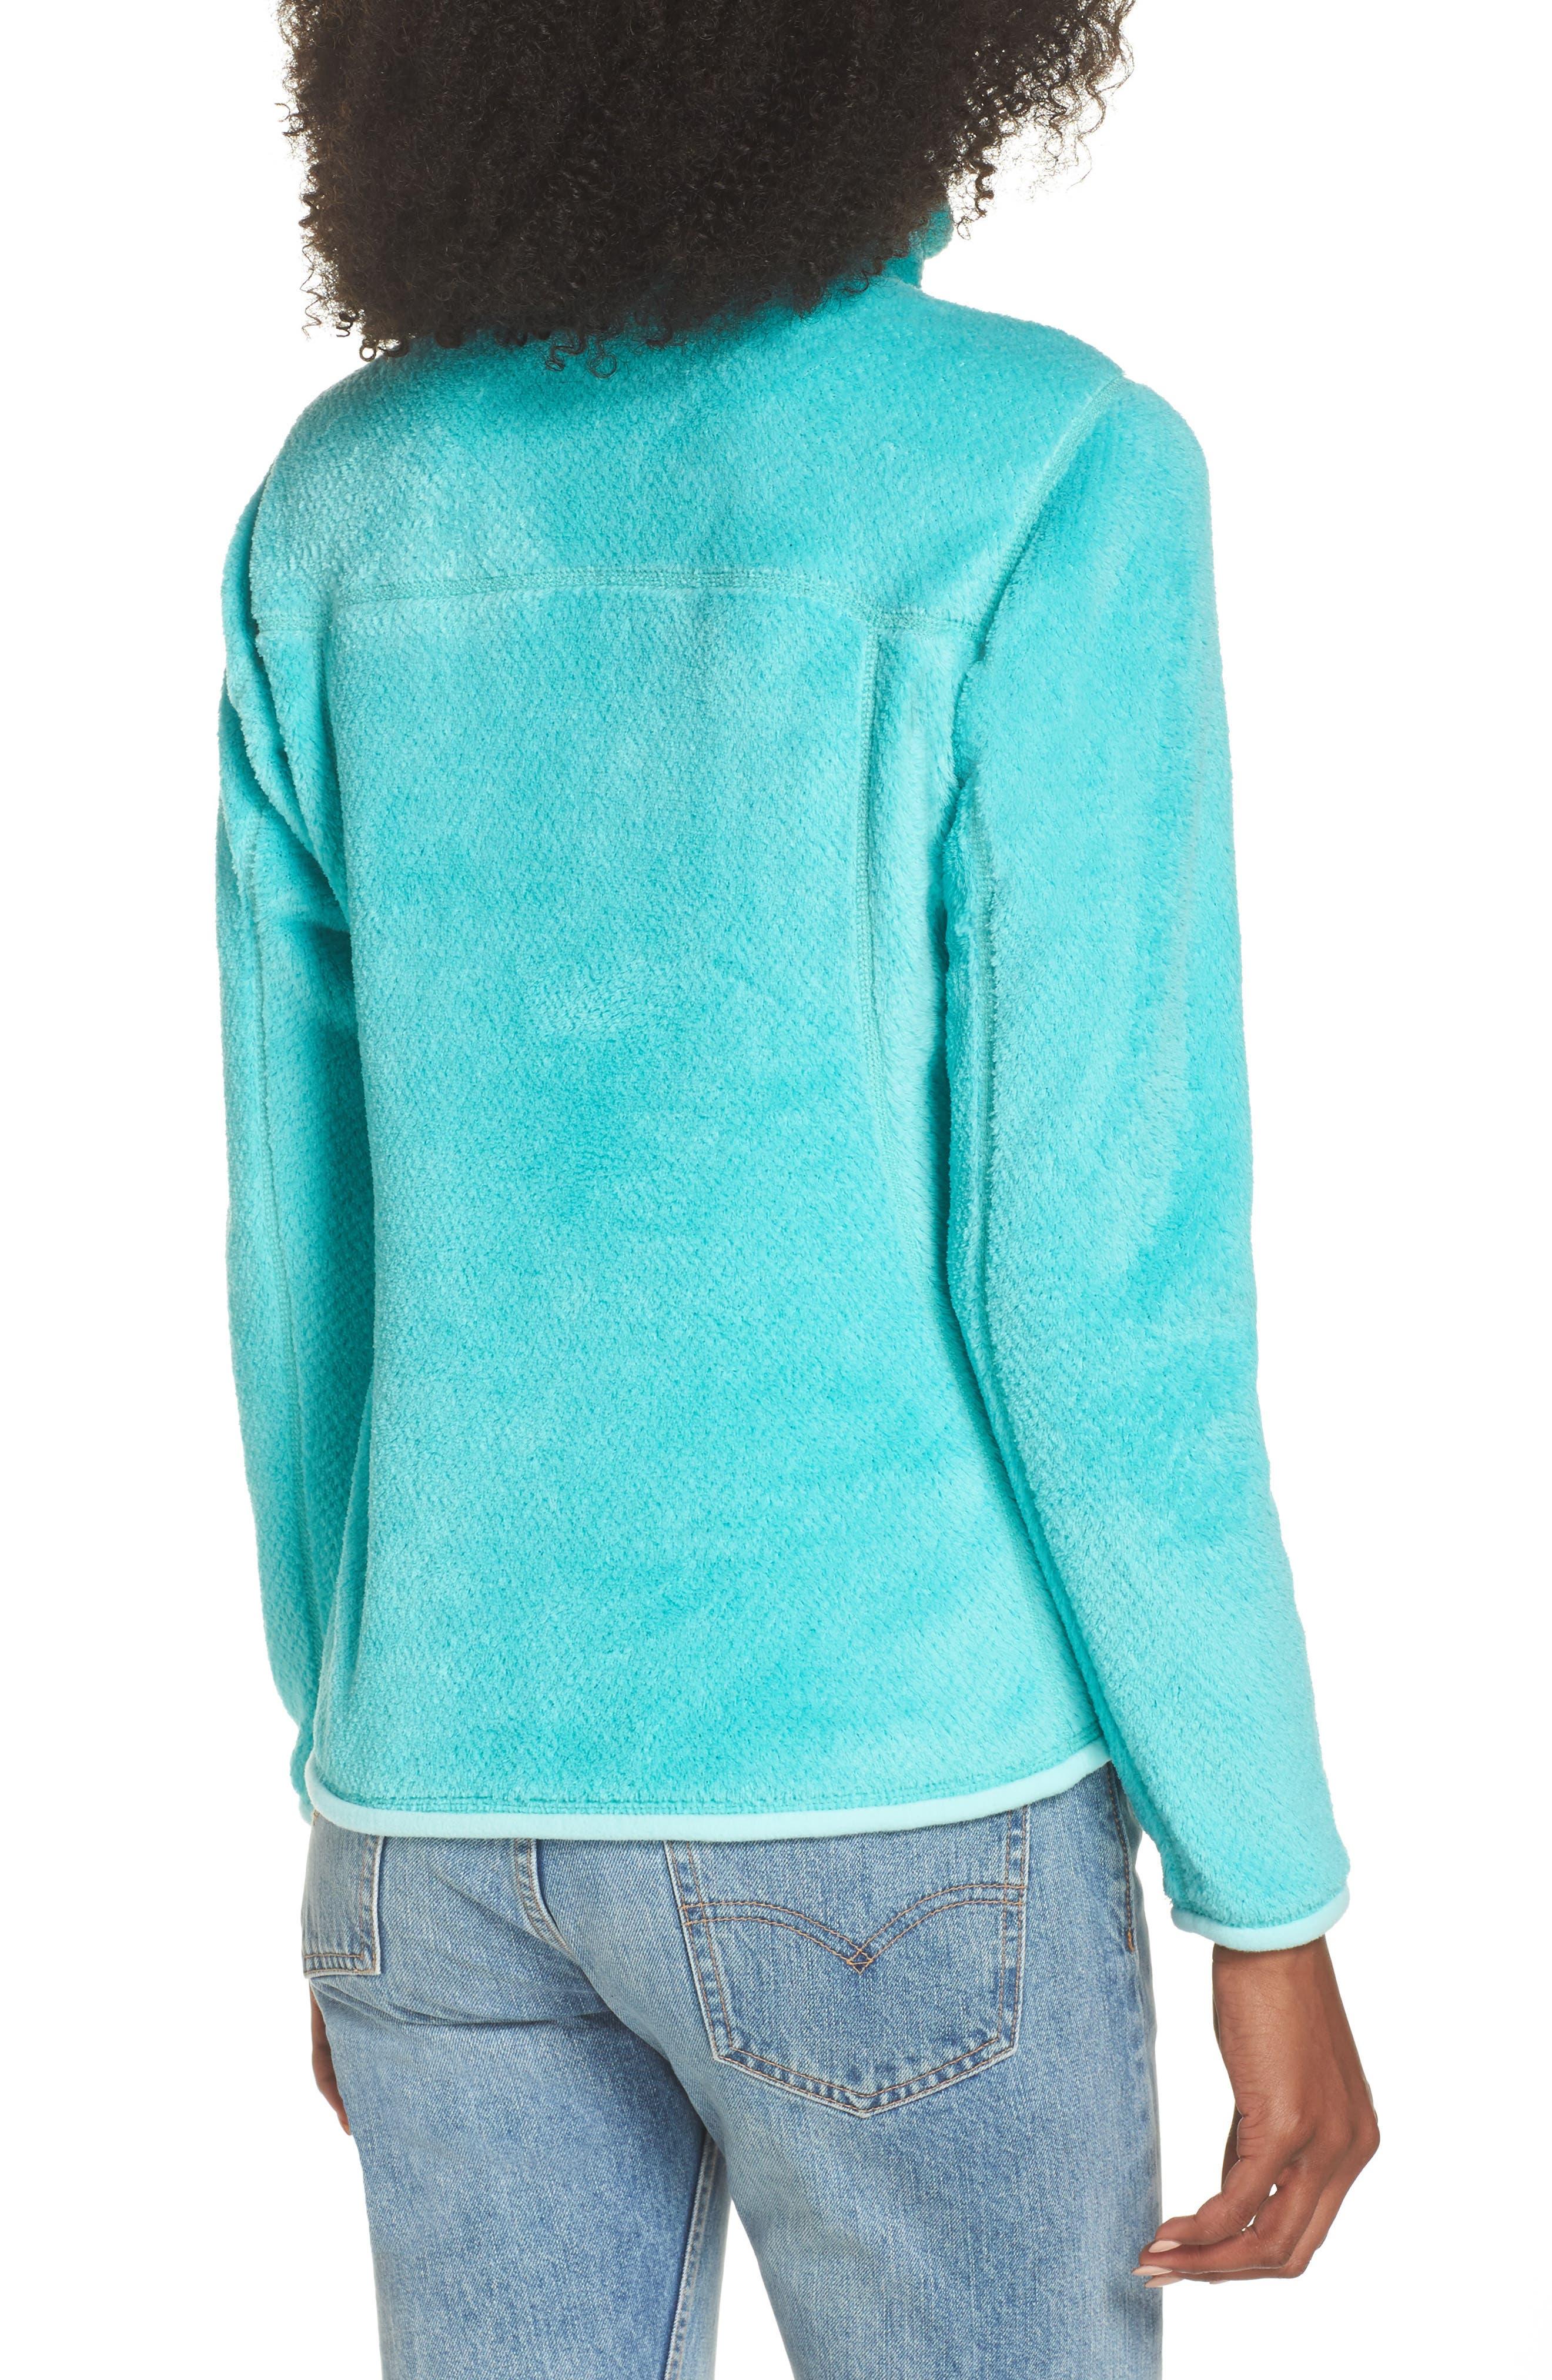 Re-Tool Snap-T<sup>®</sup> Fleece Pullover,                             Alternate thumbnail 2, color,                             Bend Blue/ Strait Blue X Dye